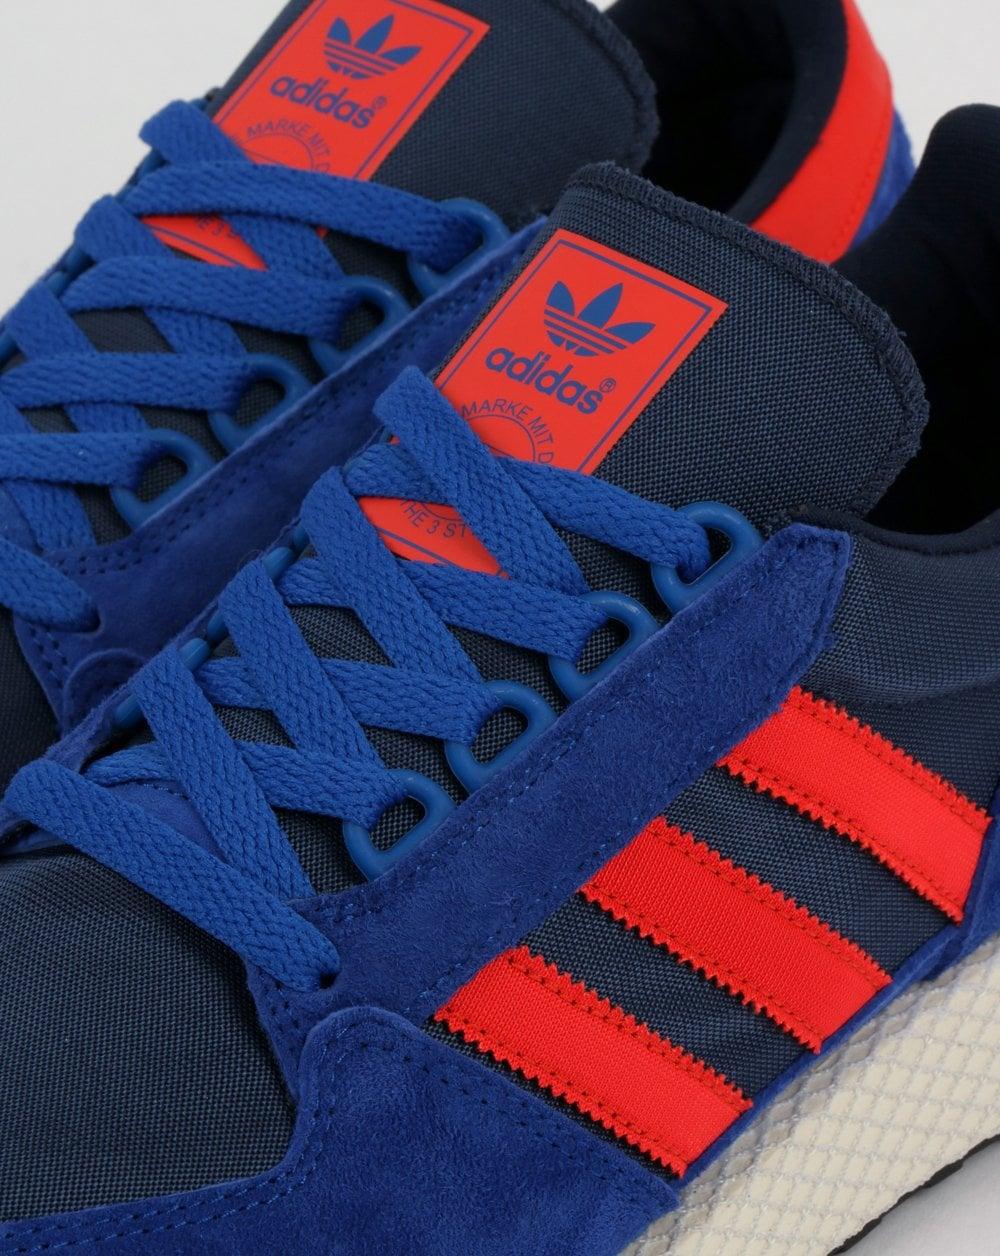 hills blue symbols forest red and noir adidas sohBQtrdxC